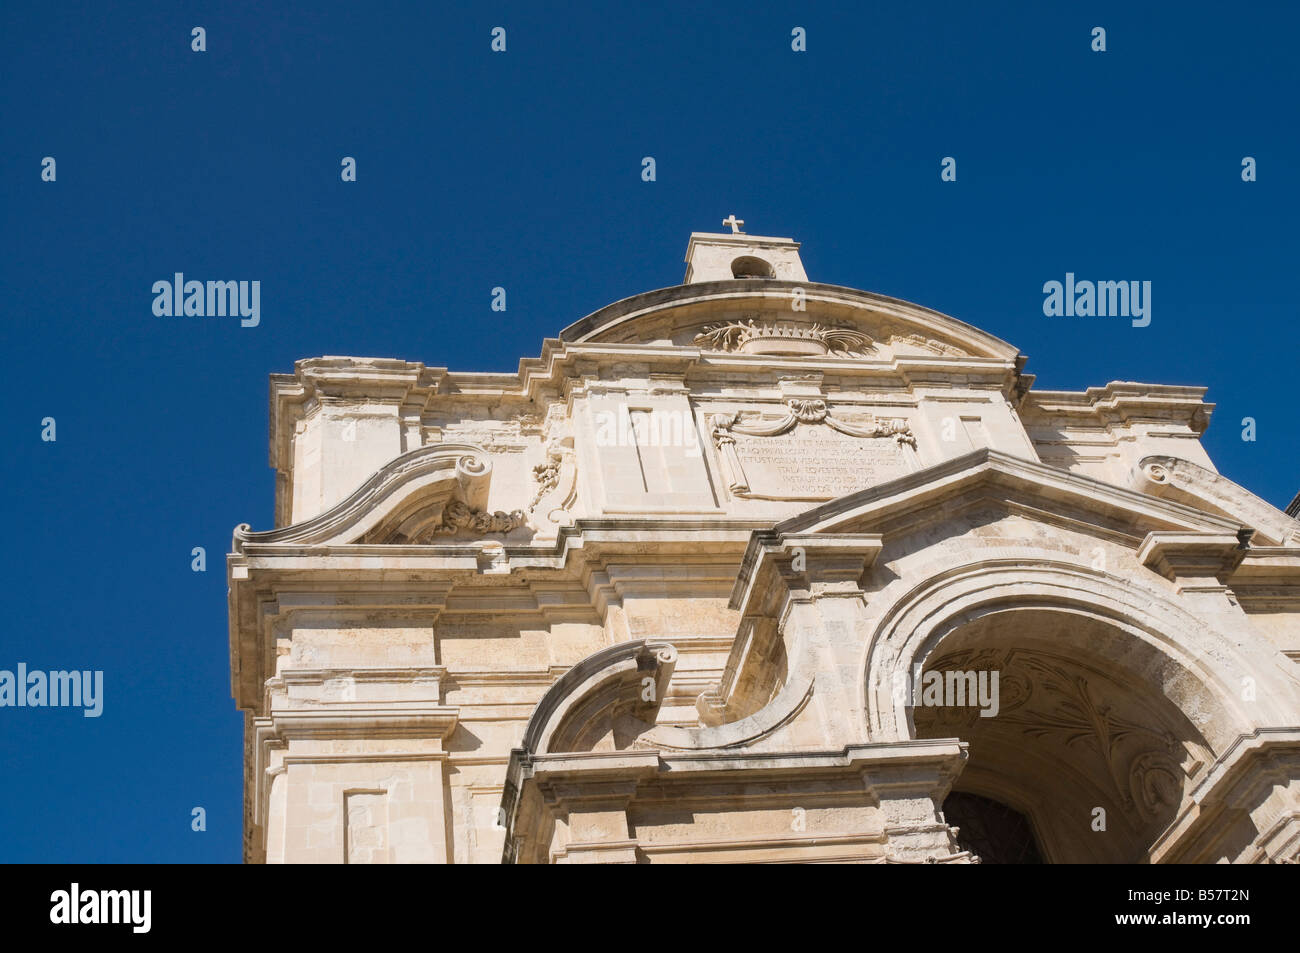 Main entrance gate to Mdina, Malta, Europe - Stock Image